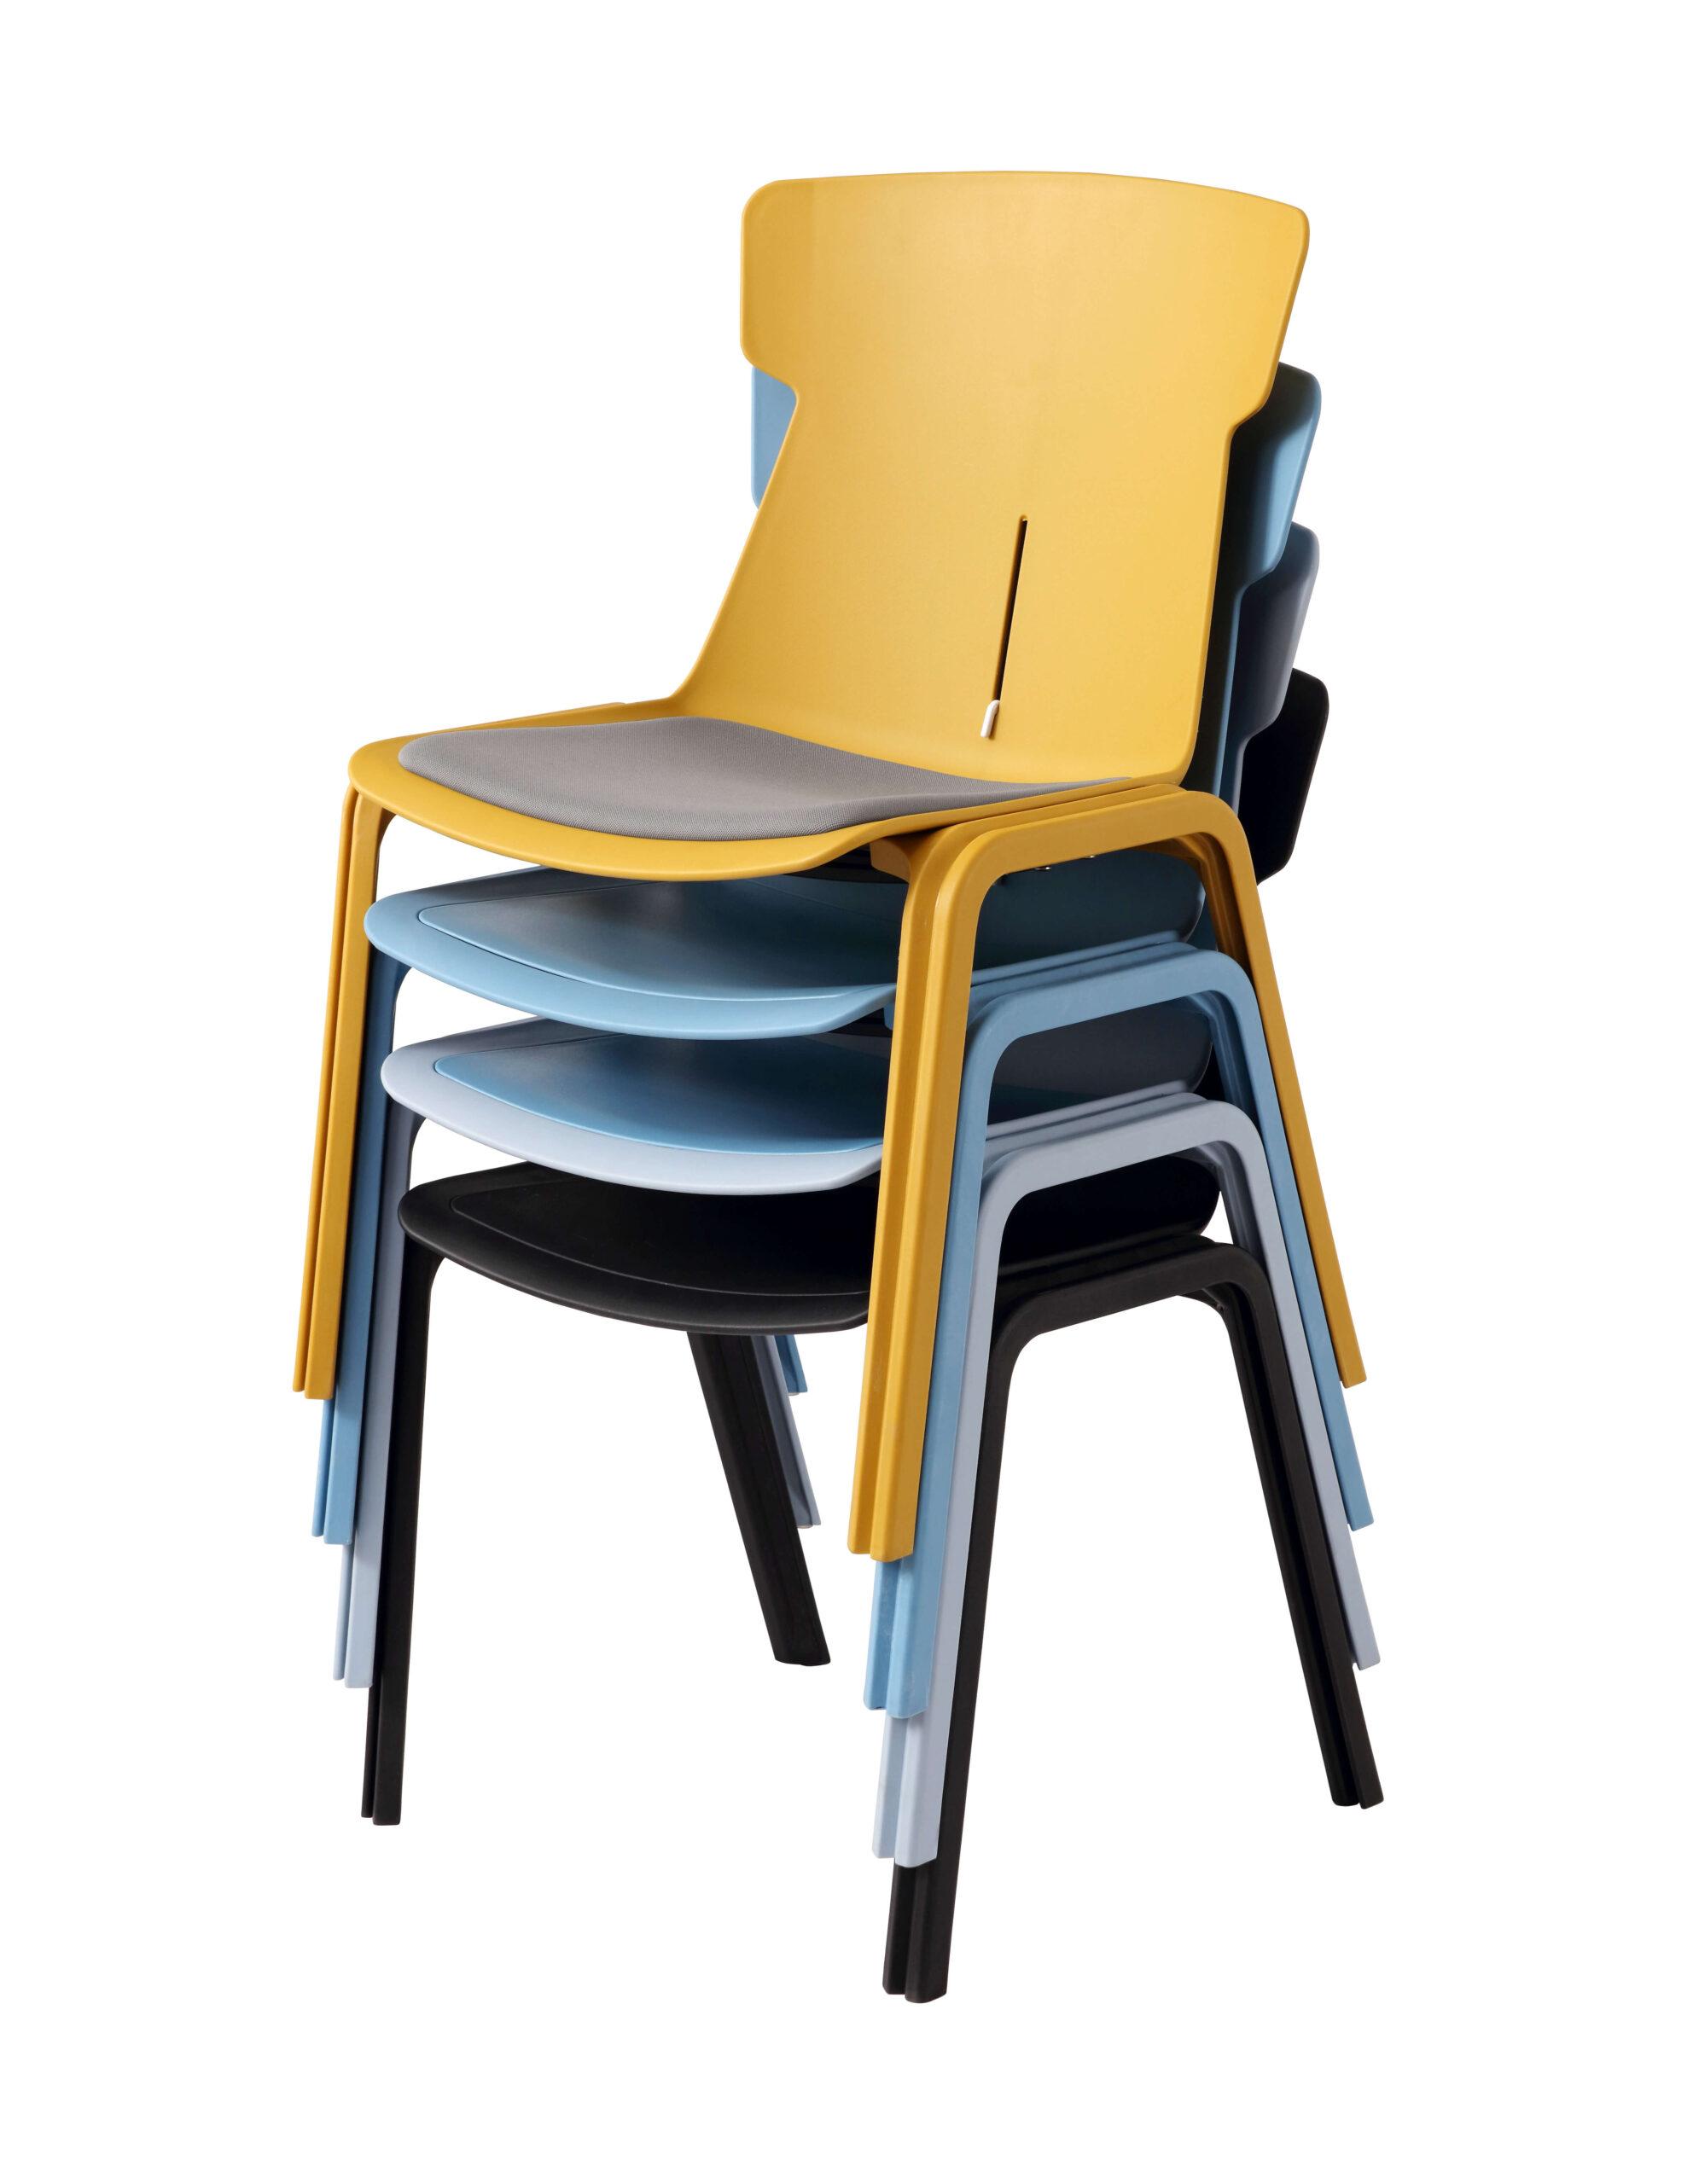 Children's dining chair series